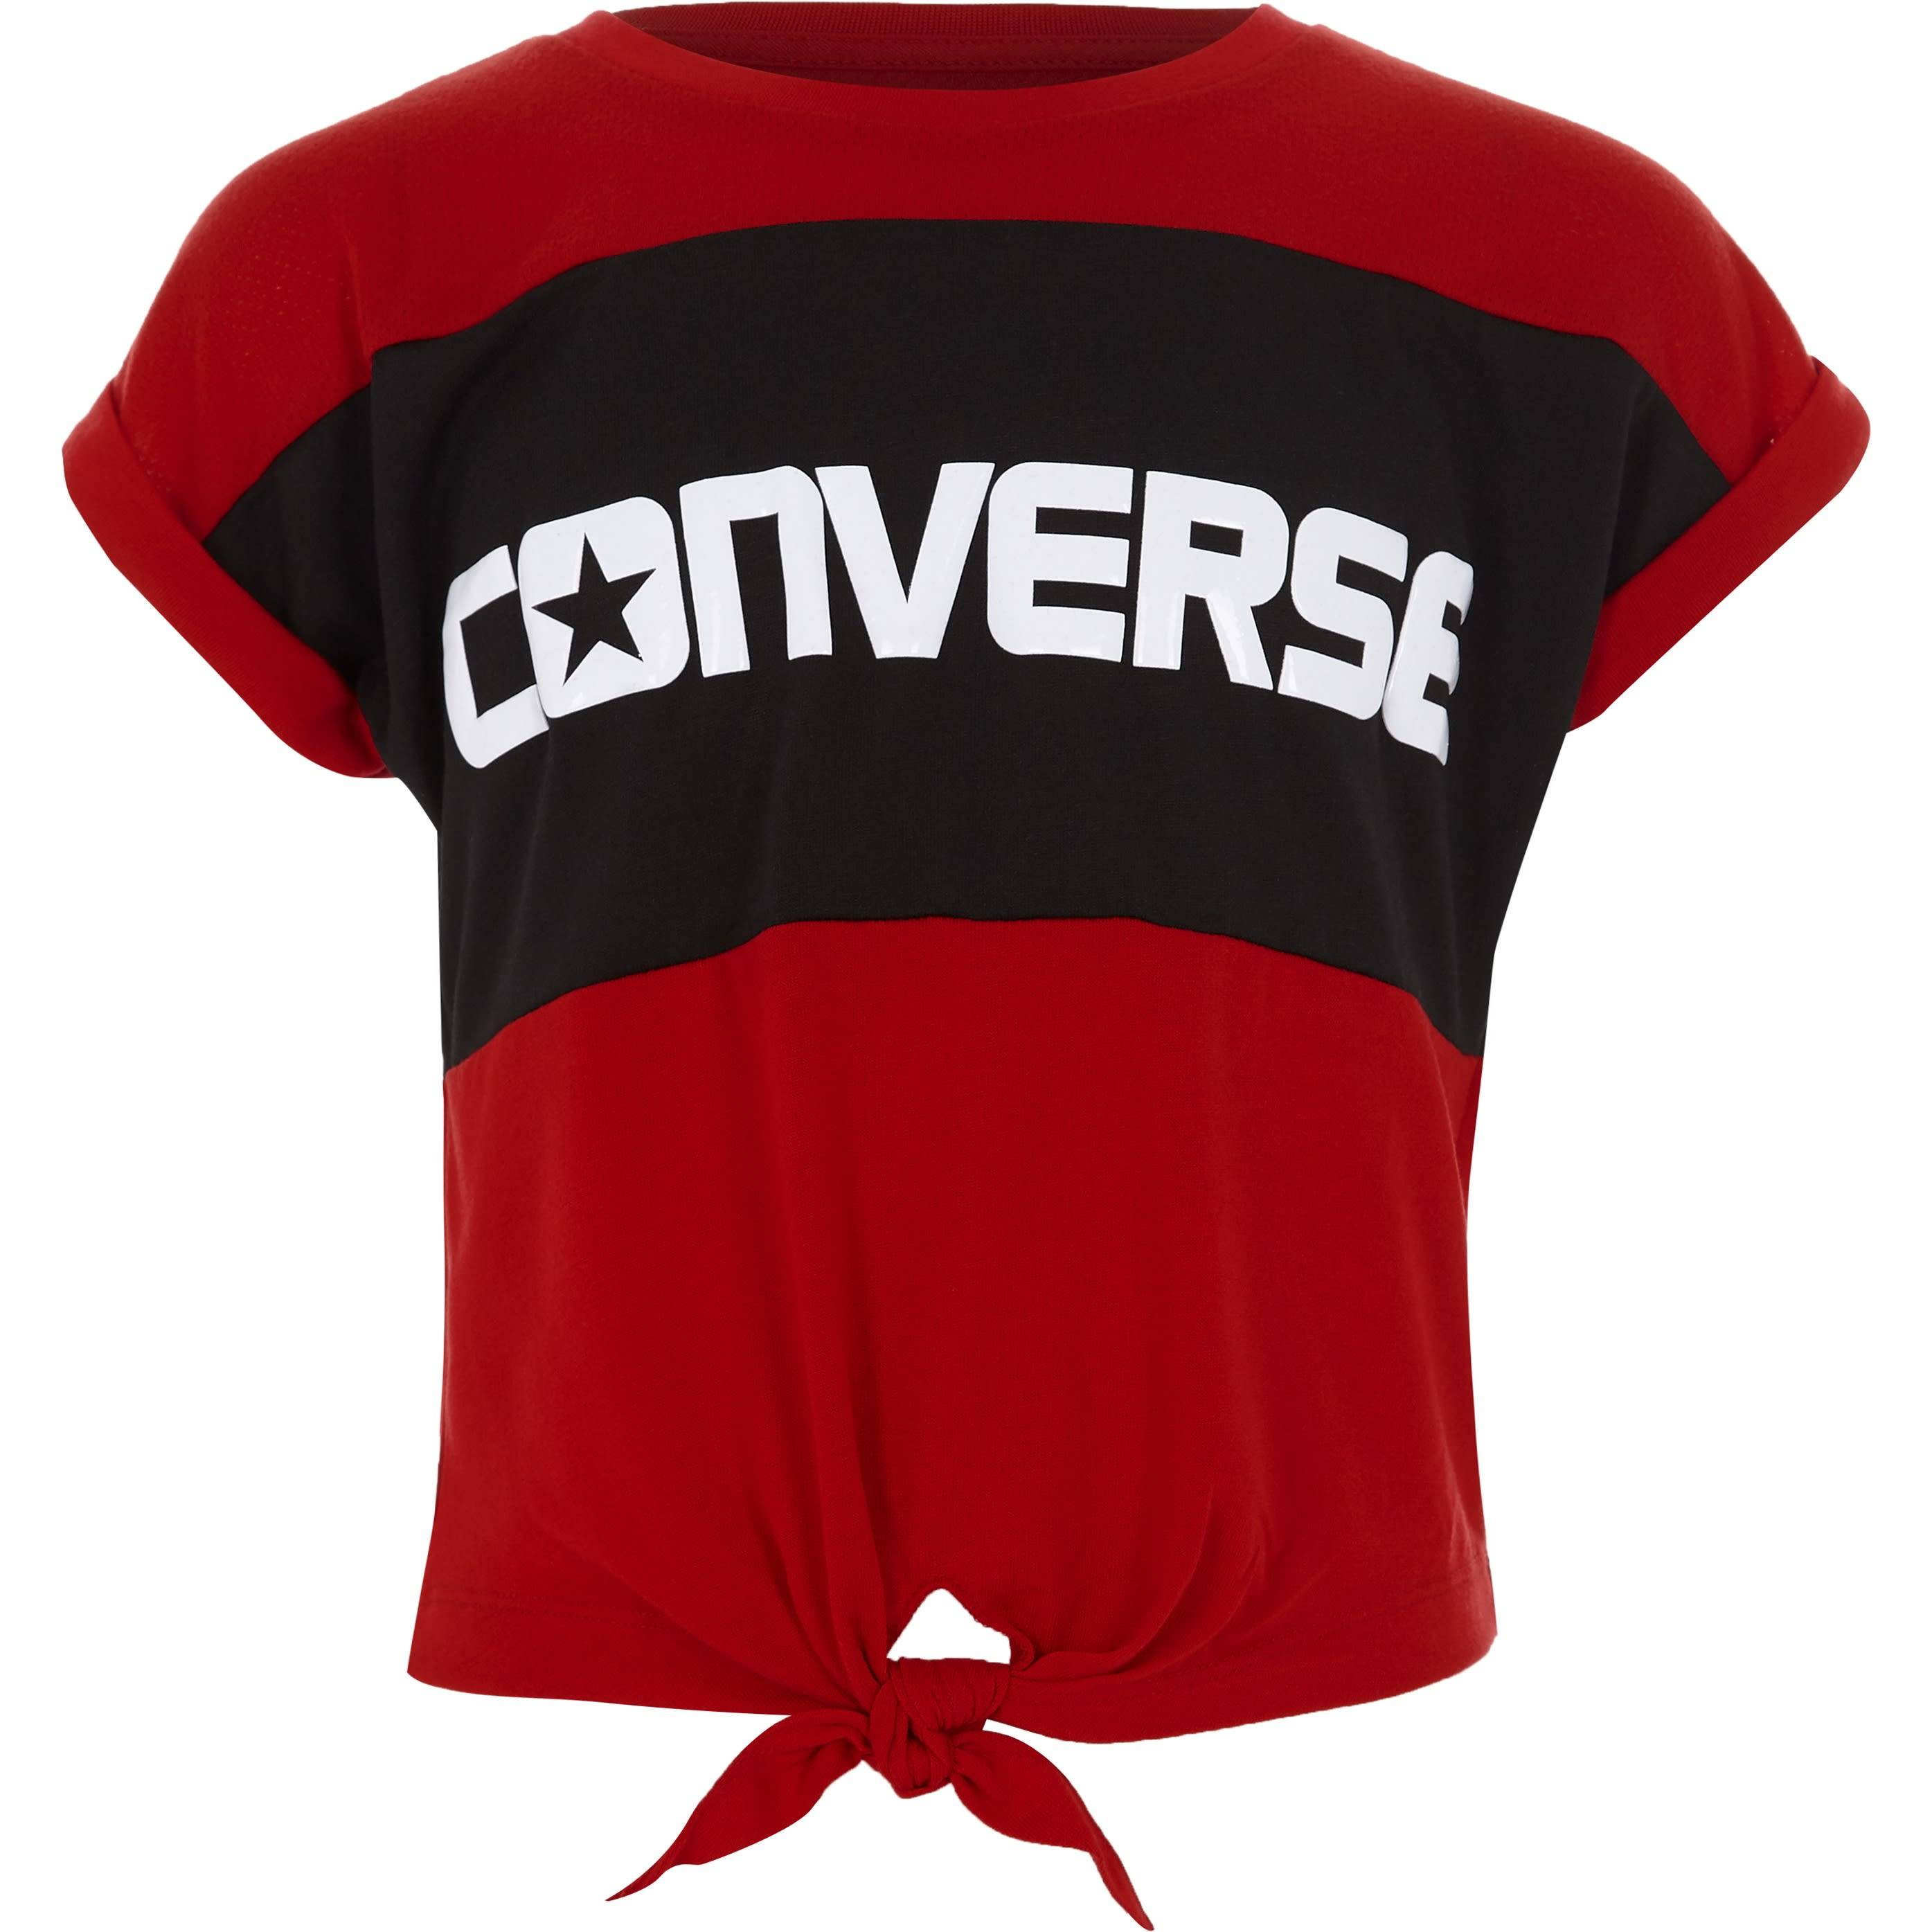 Converse Girls Converse Red block knot front T-shirt (5-6 Yrs)